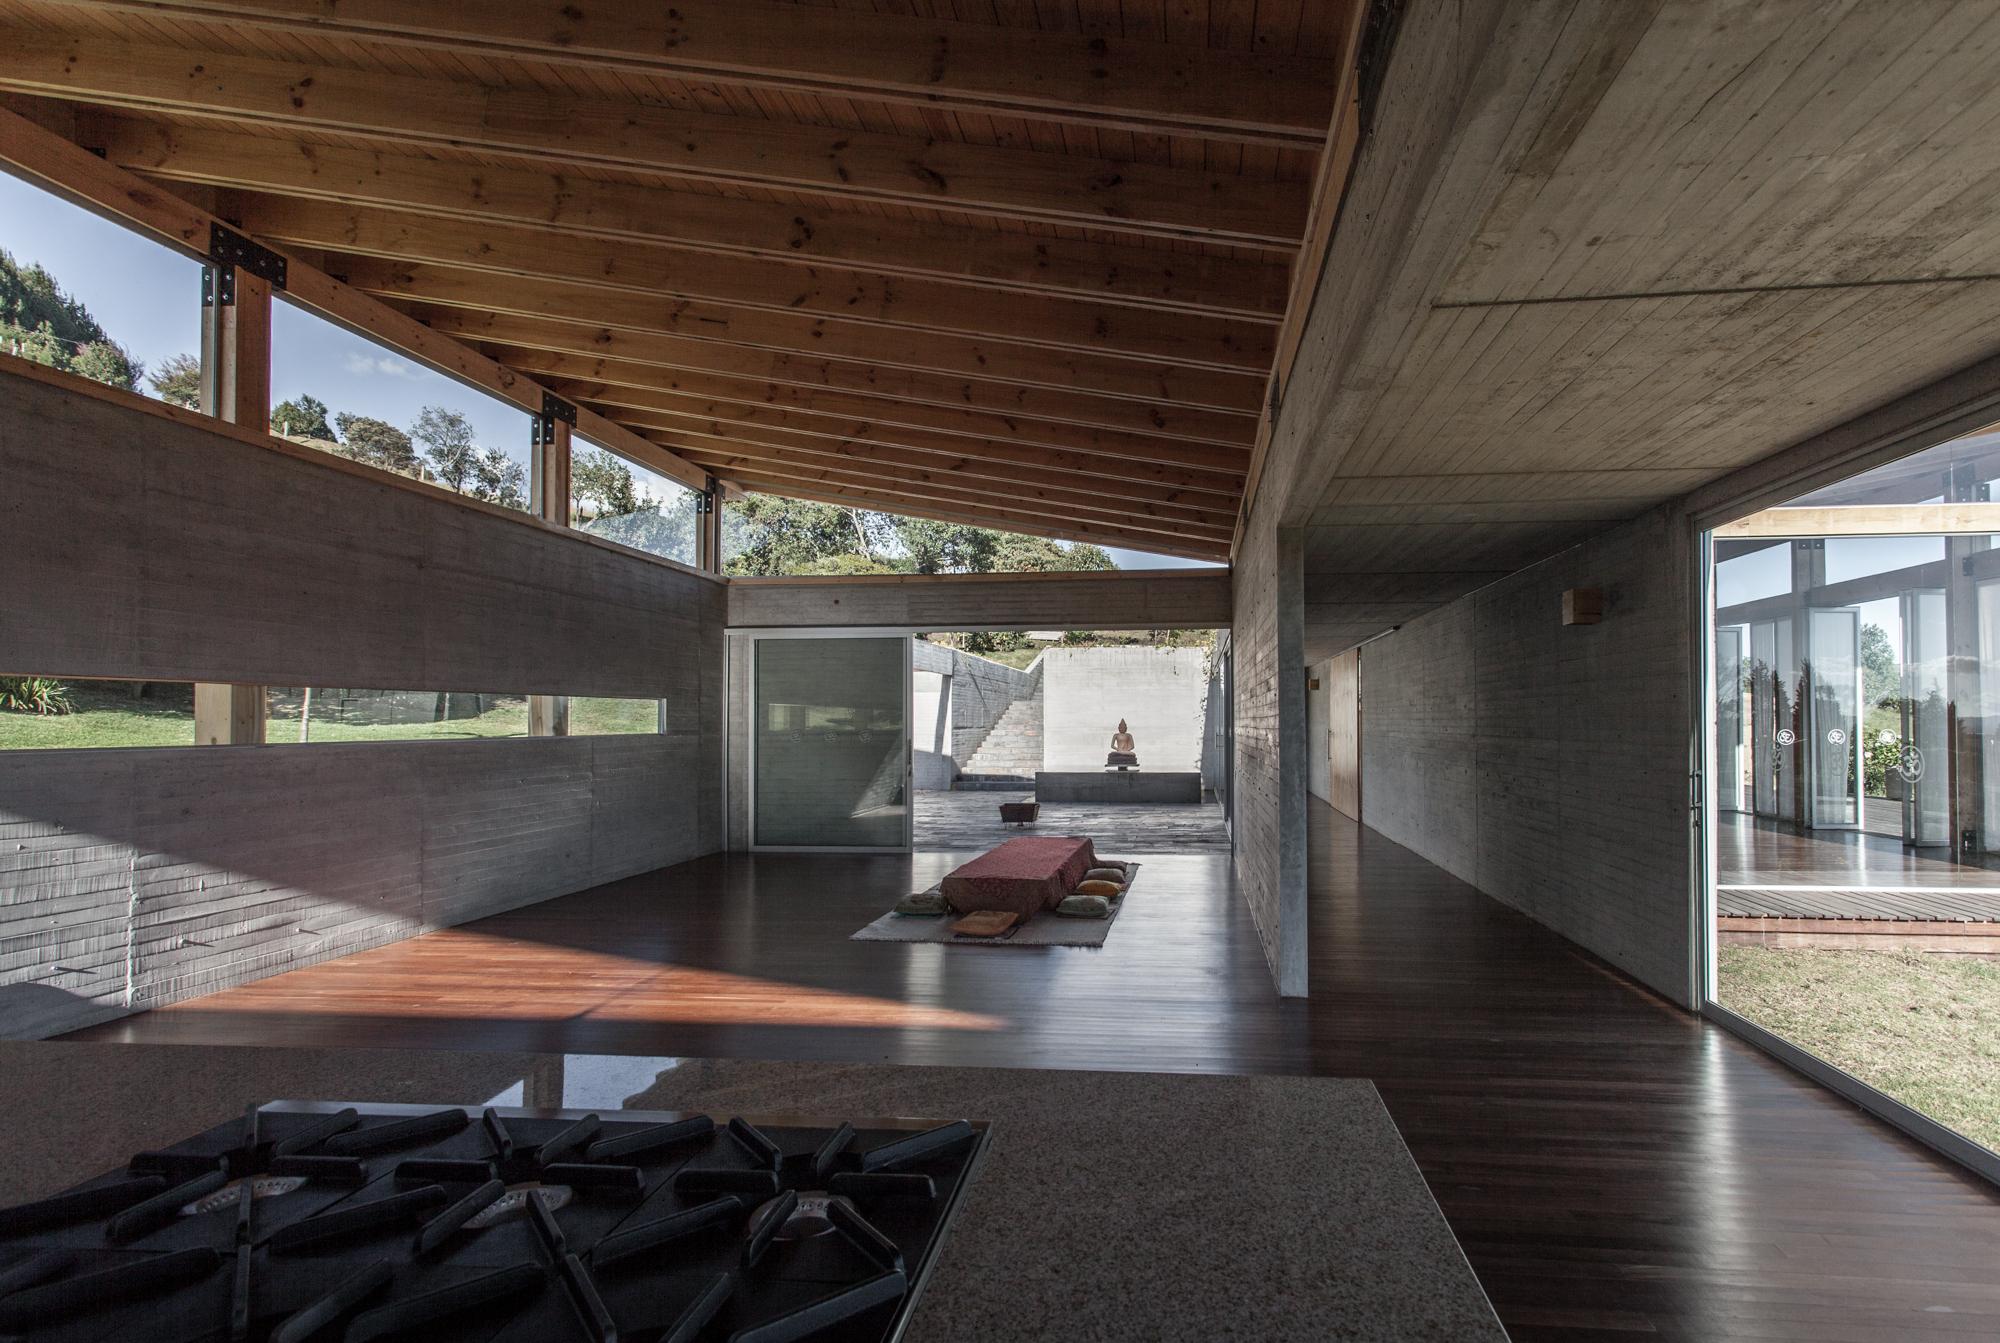 gallery of kamadhenu yoga studio carolina echevarri alberto burckhardt 4. Black Bedroom Furniture Sets. Home Design Ideas